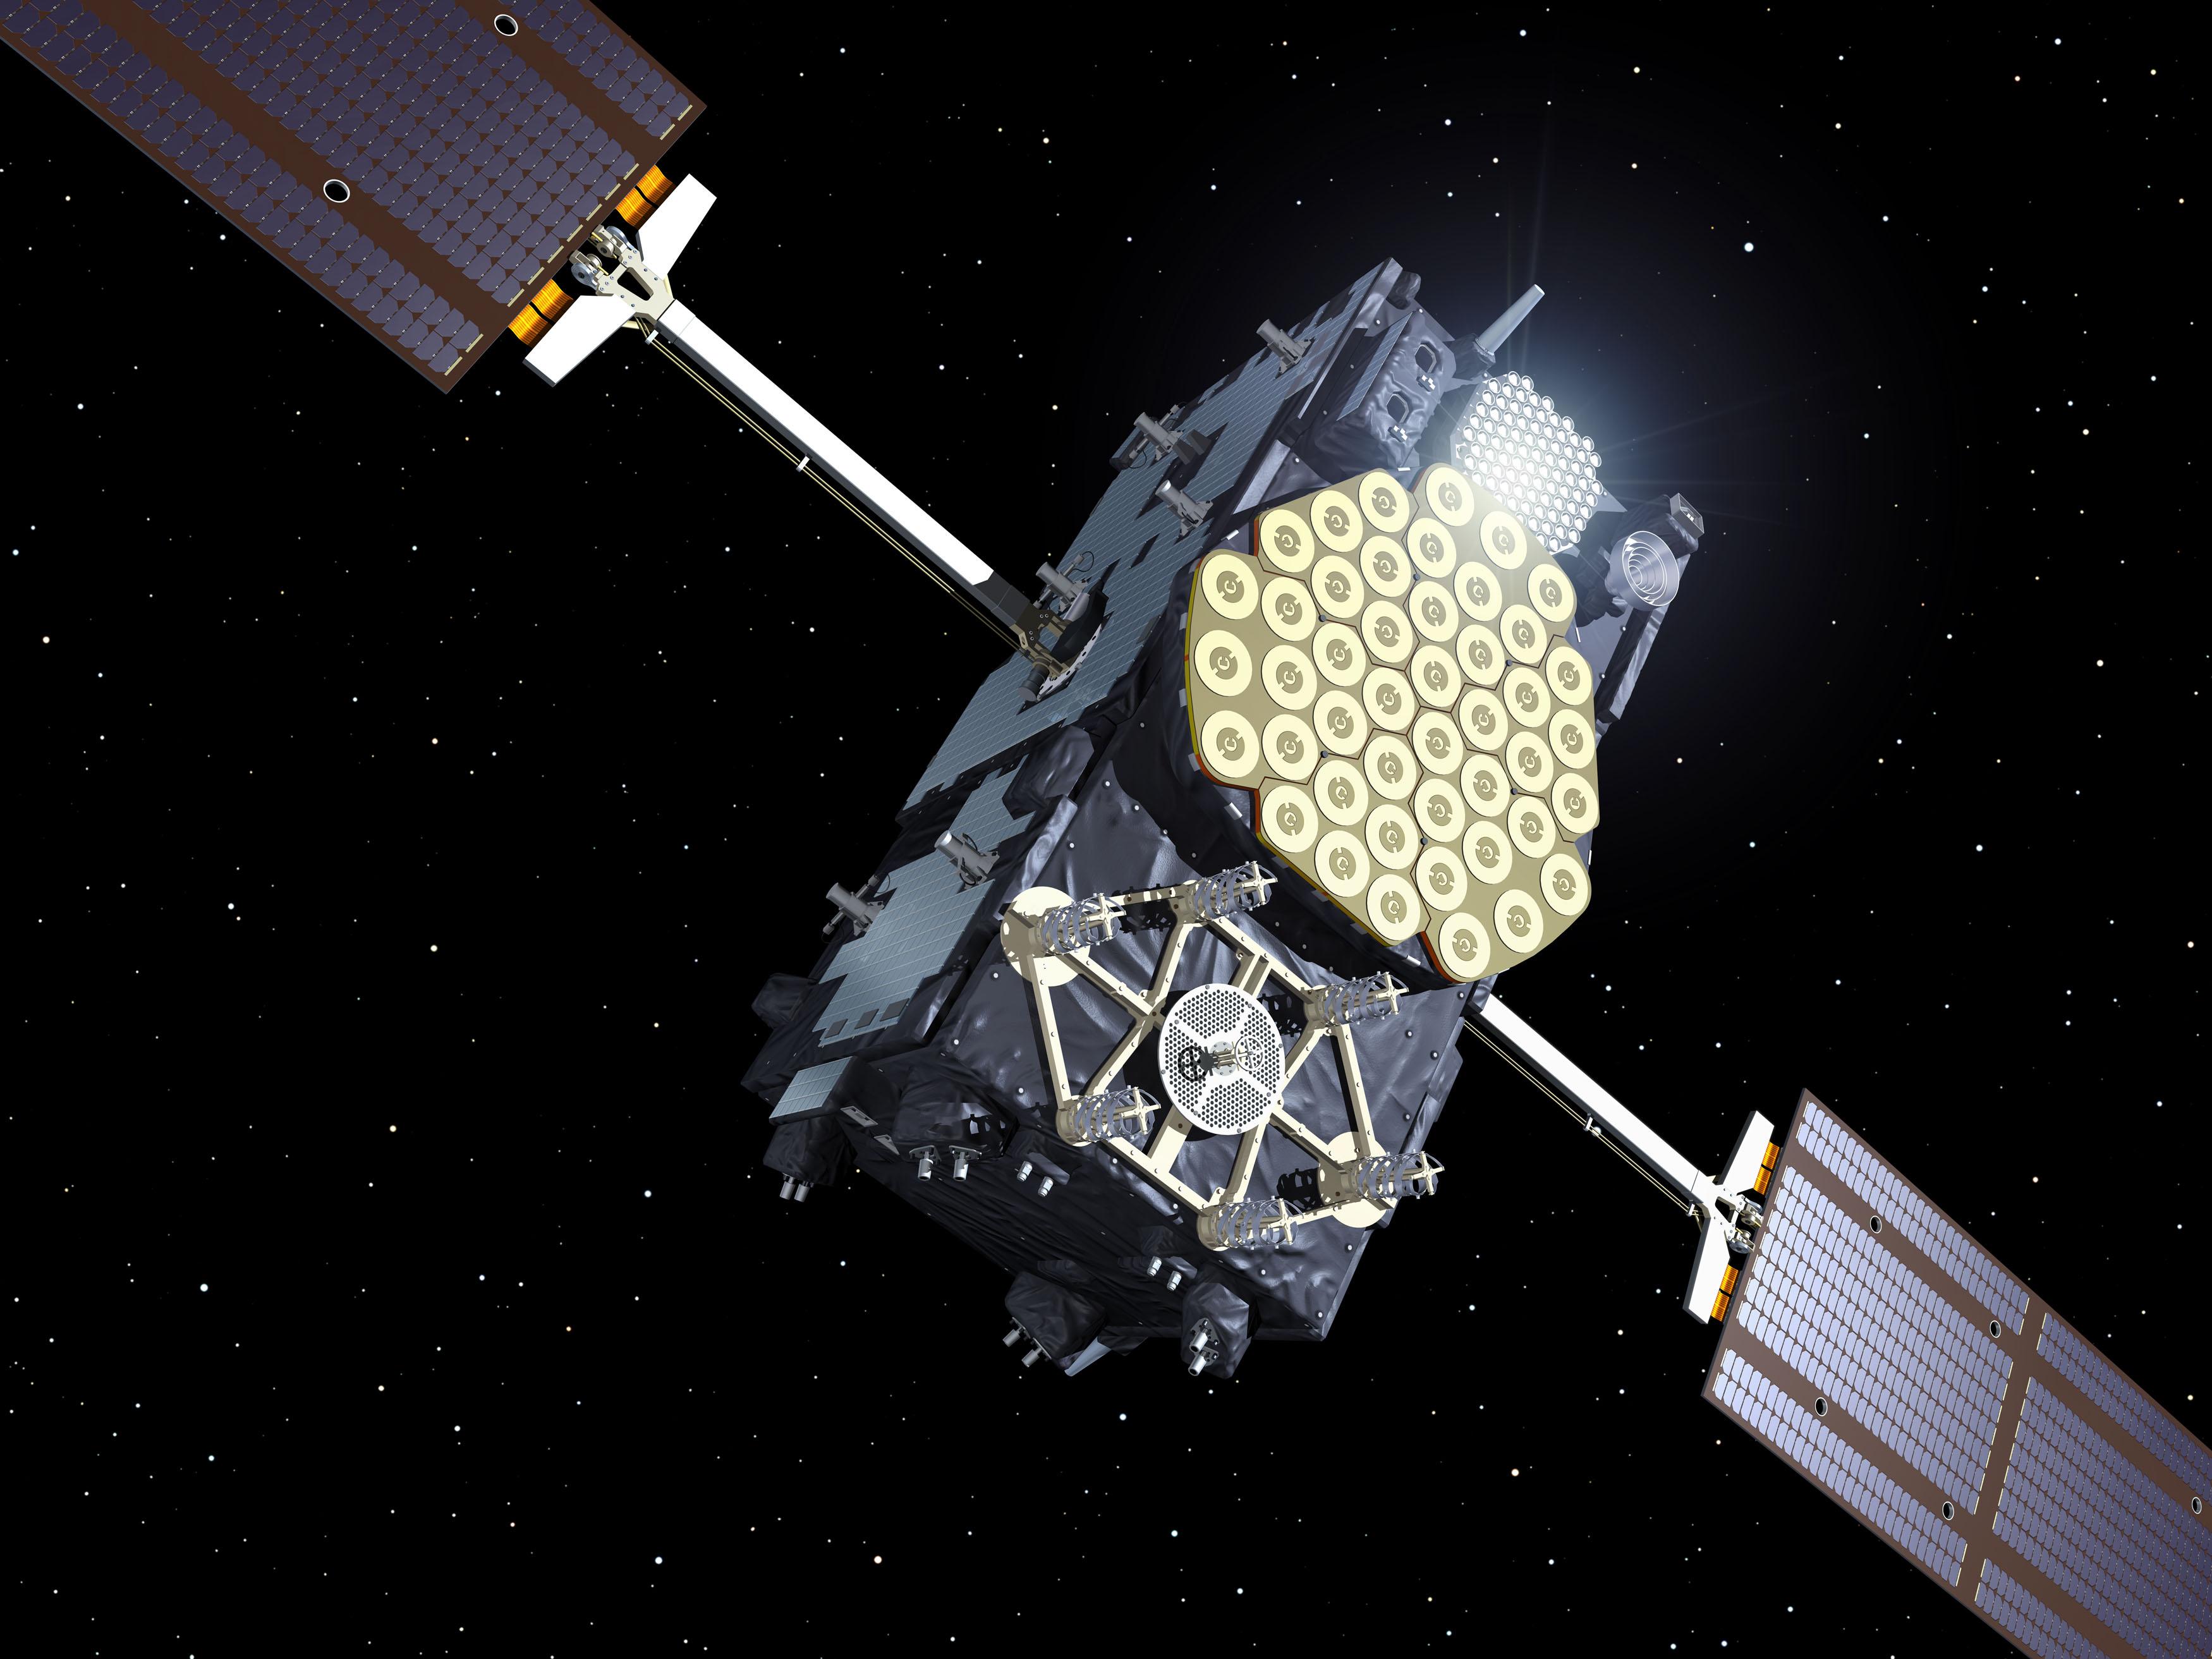 Wayward European satellite is back on track, transmits first